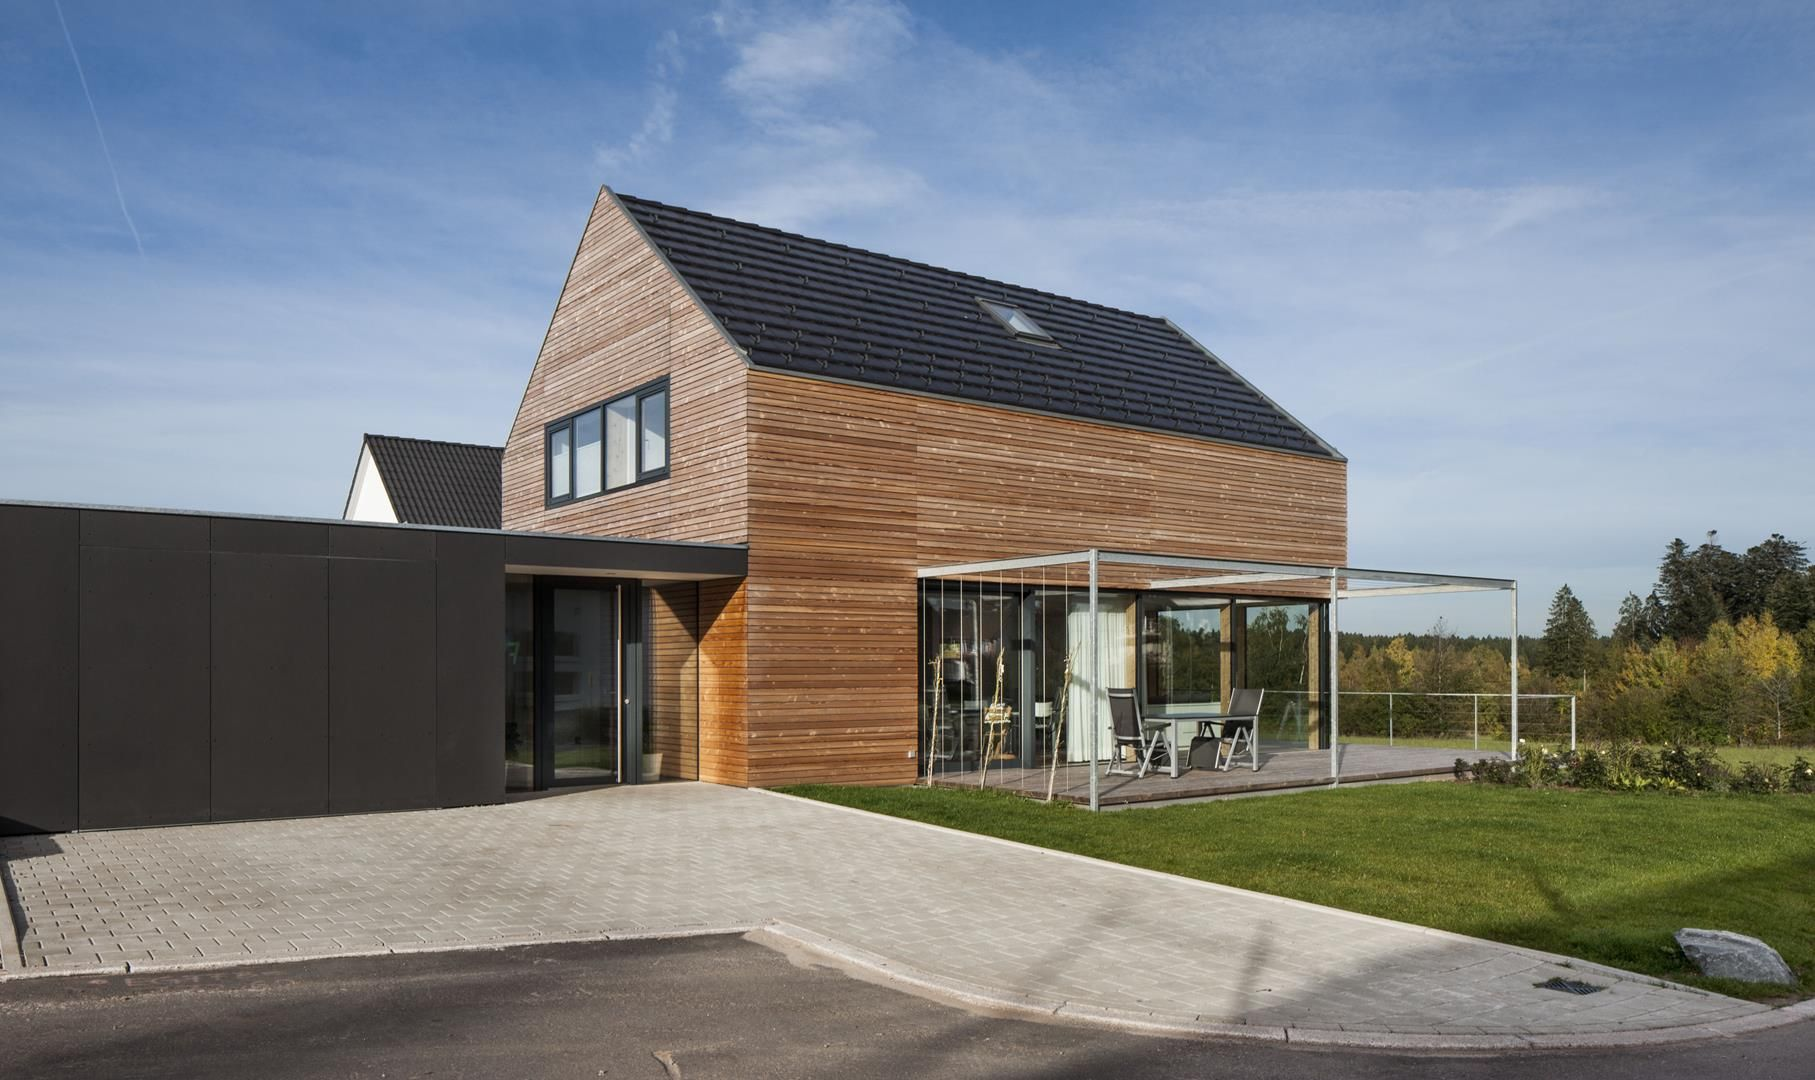 1000+ ideas about Moderne Holzhäuser on Pinterest Glasdach, Log ... size: 1815 x 1080 post ID: 8 File size: 0 B